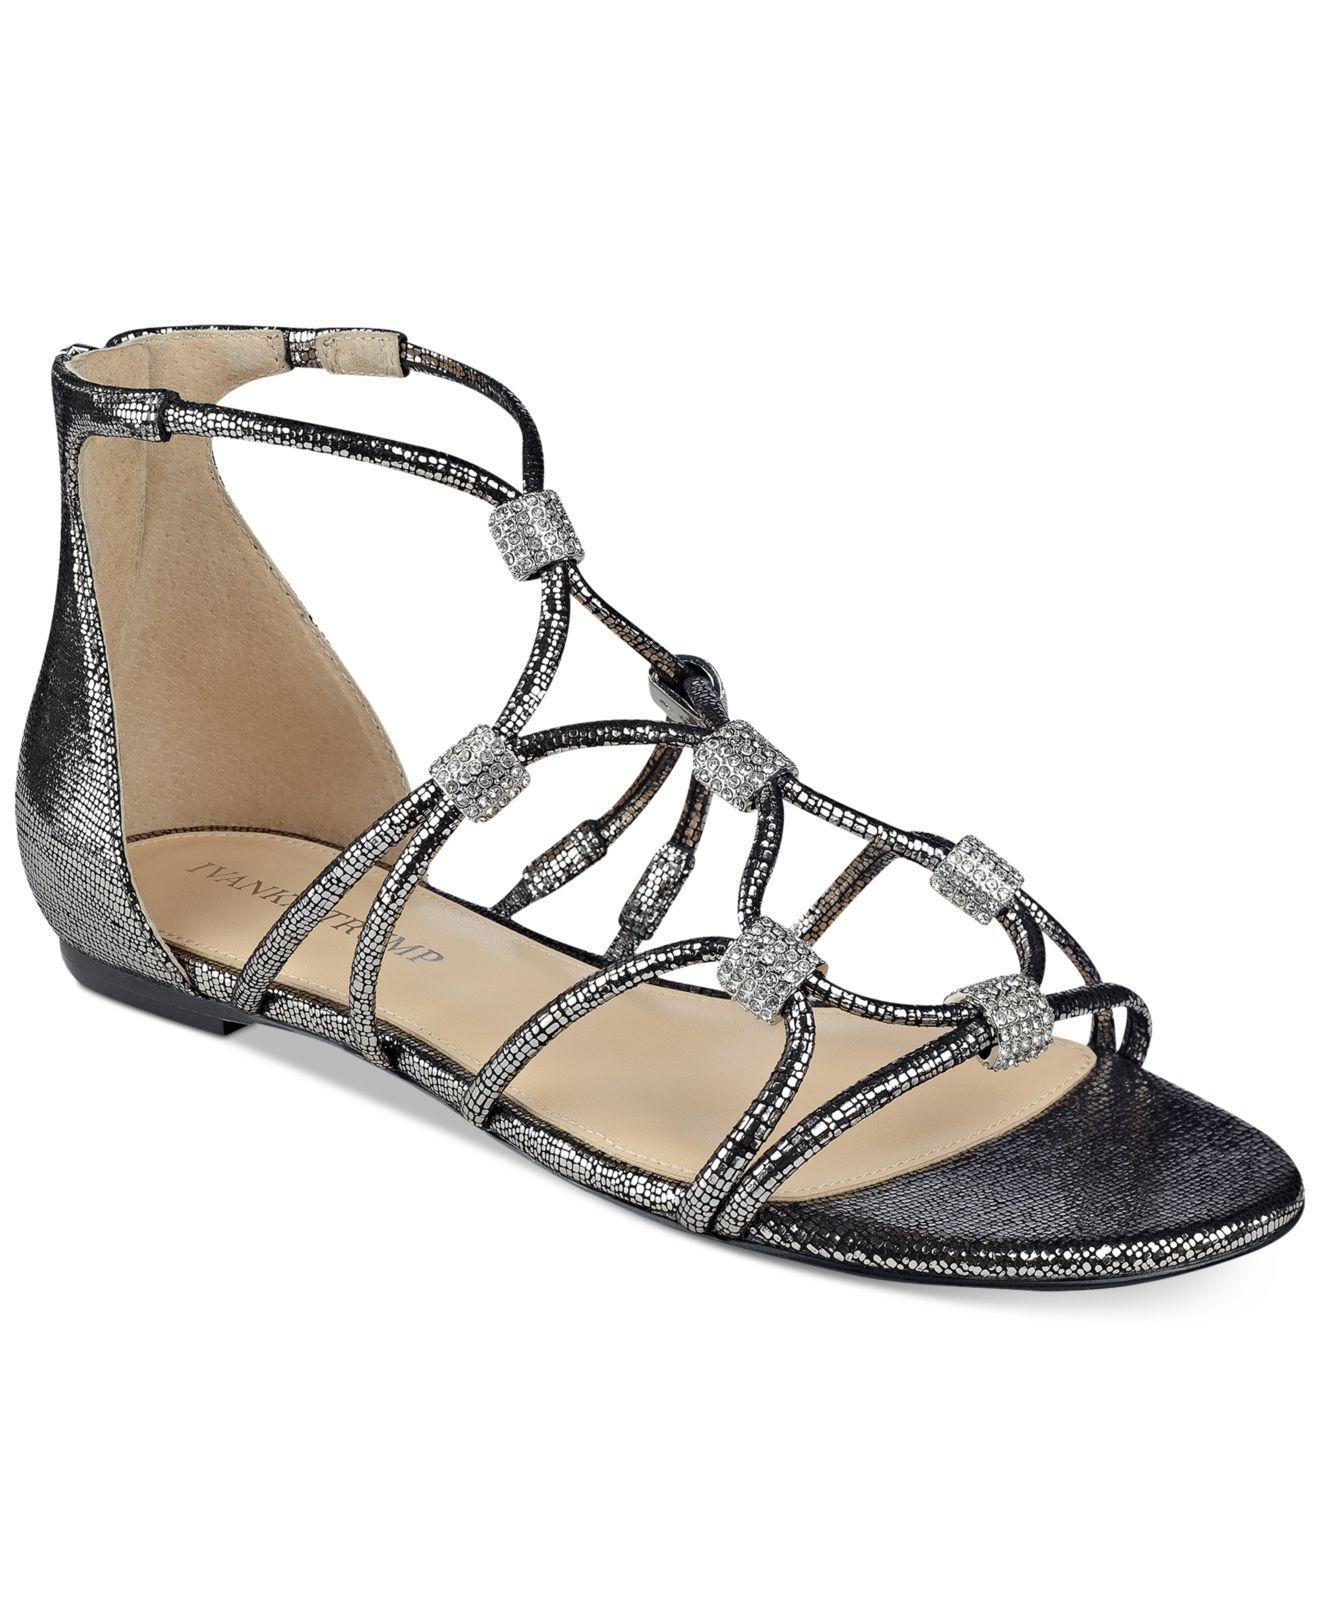 Ivanka Trump Chaley 2 Flat Strappy Sandals Lyst